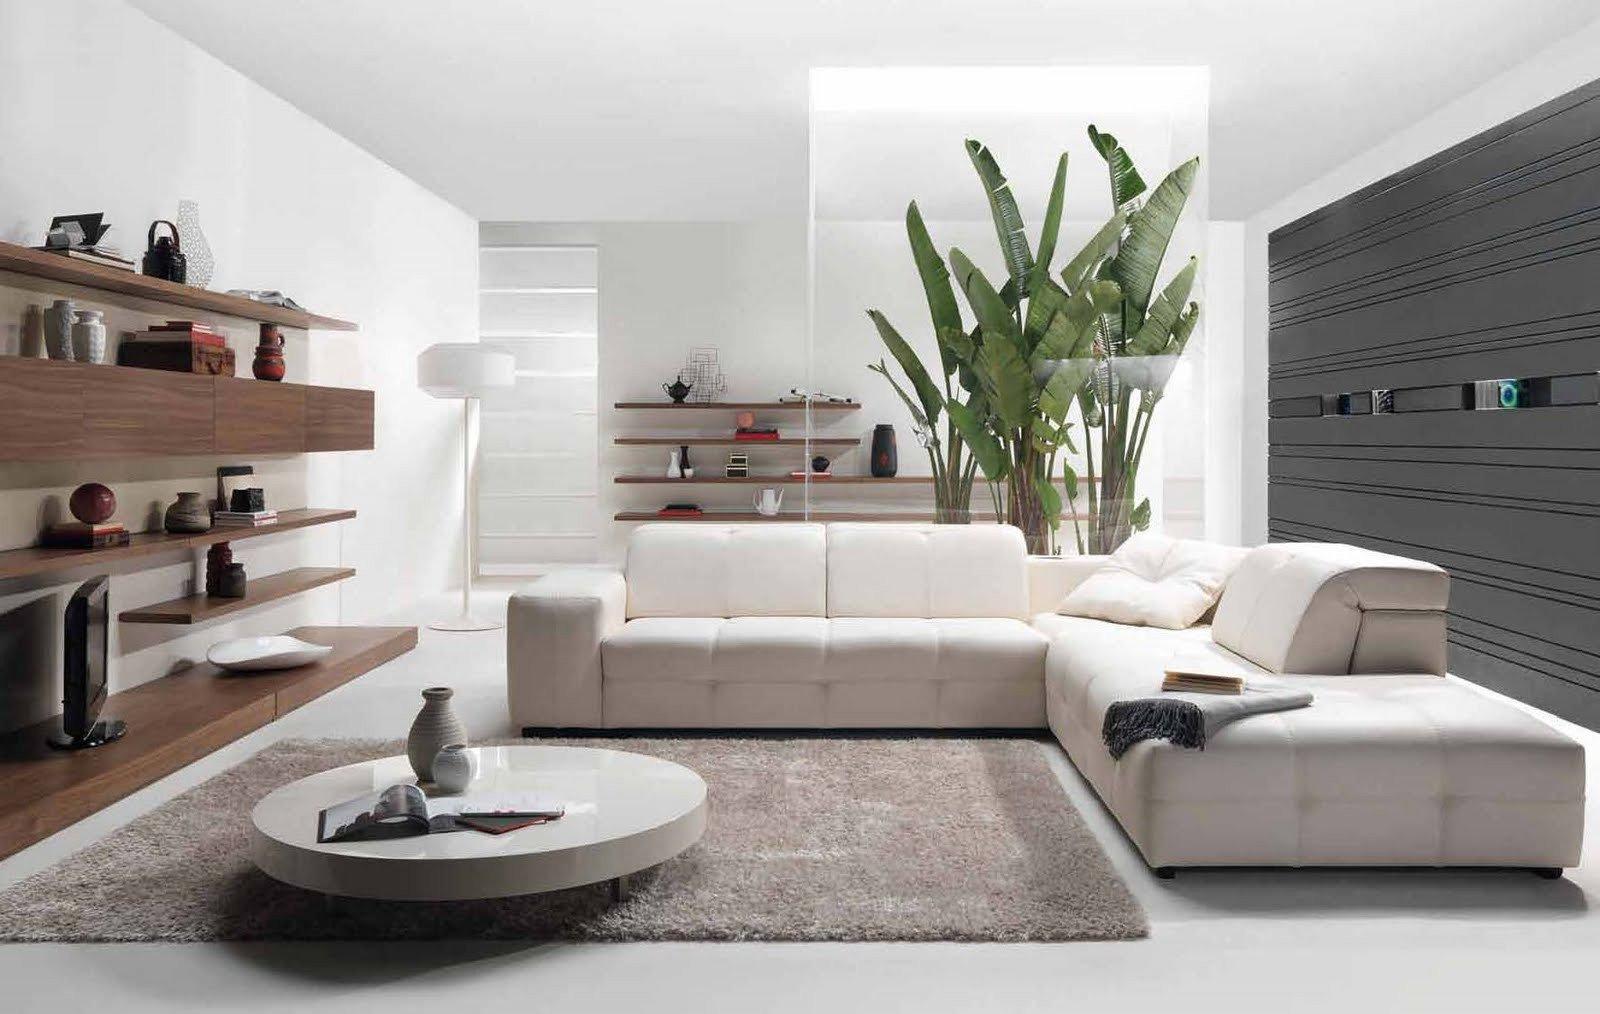 Living Room Decor Ideas Modern 25 Modern Living Room Decor Ideas – the Wow Style